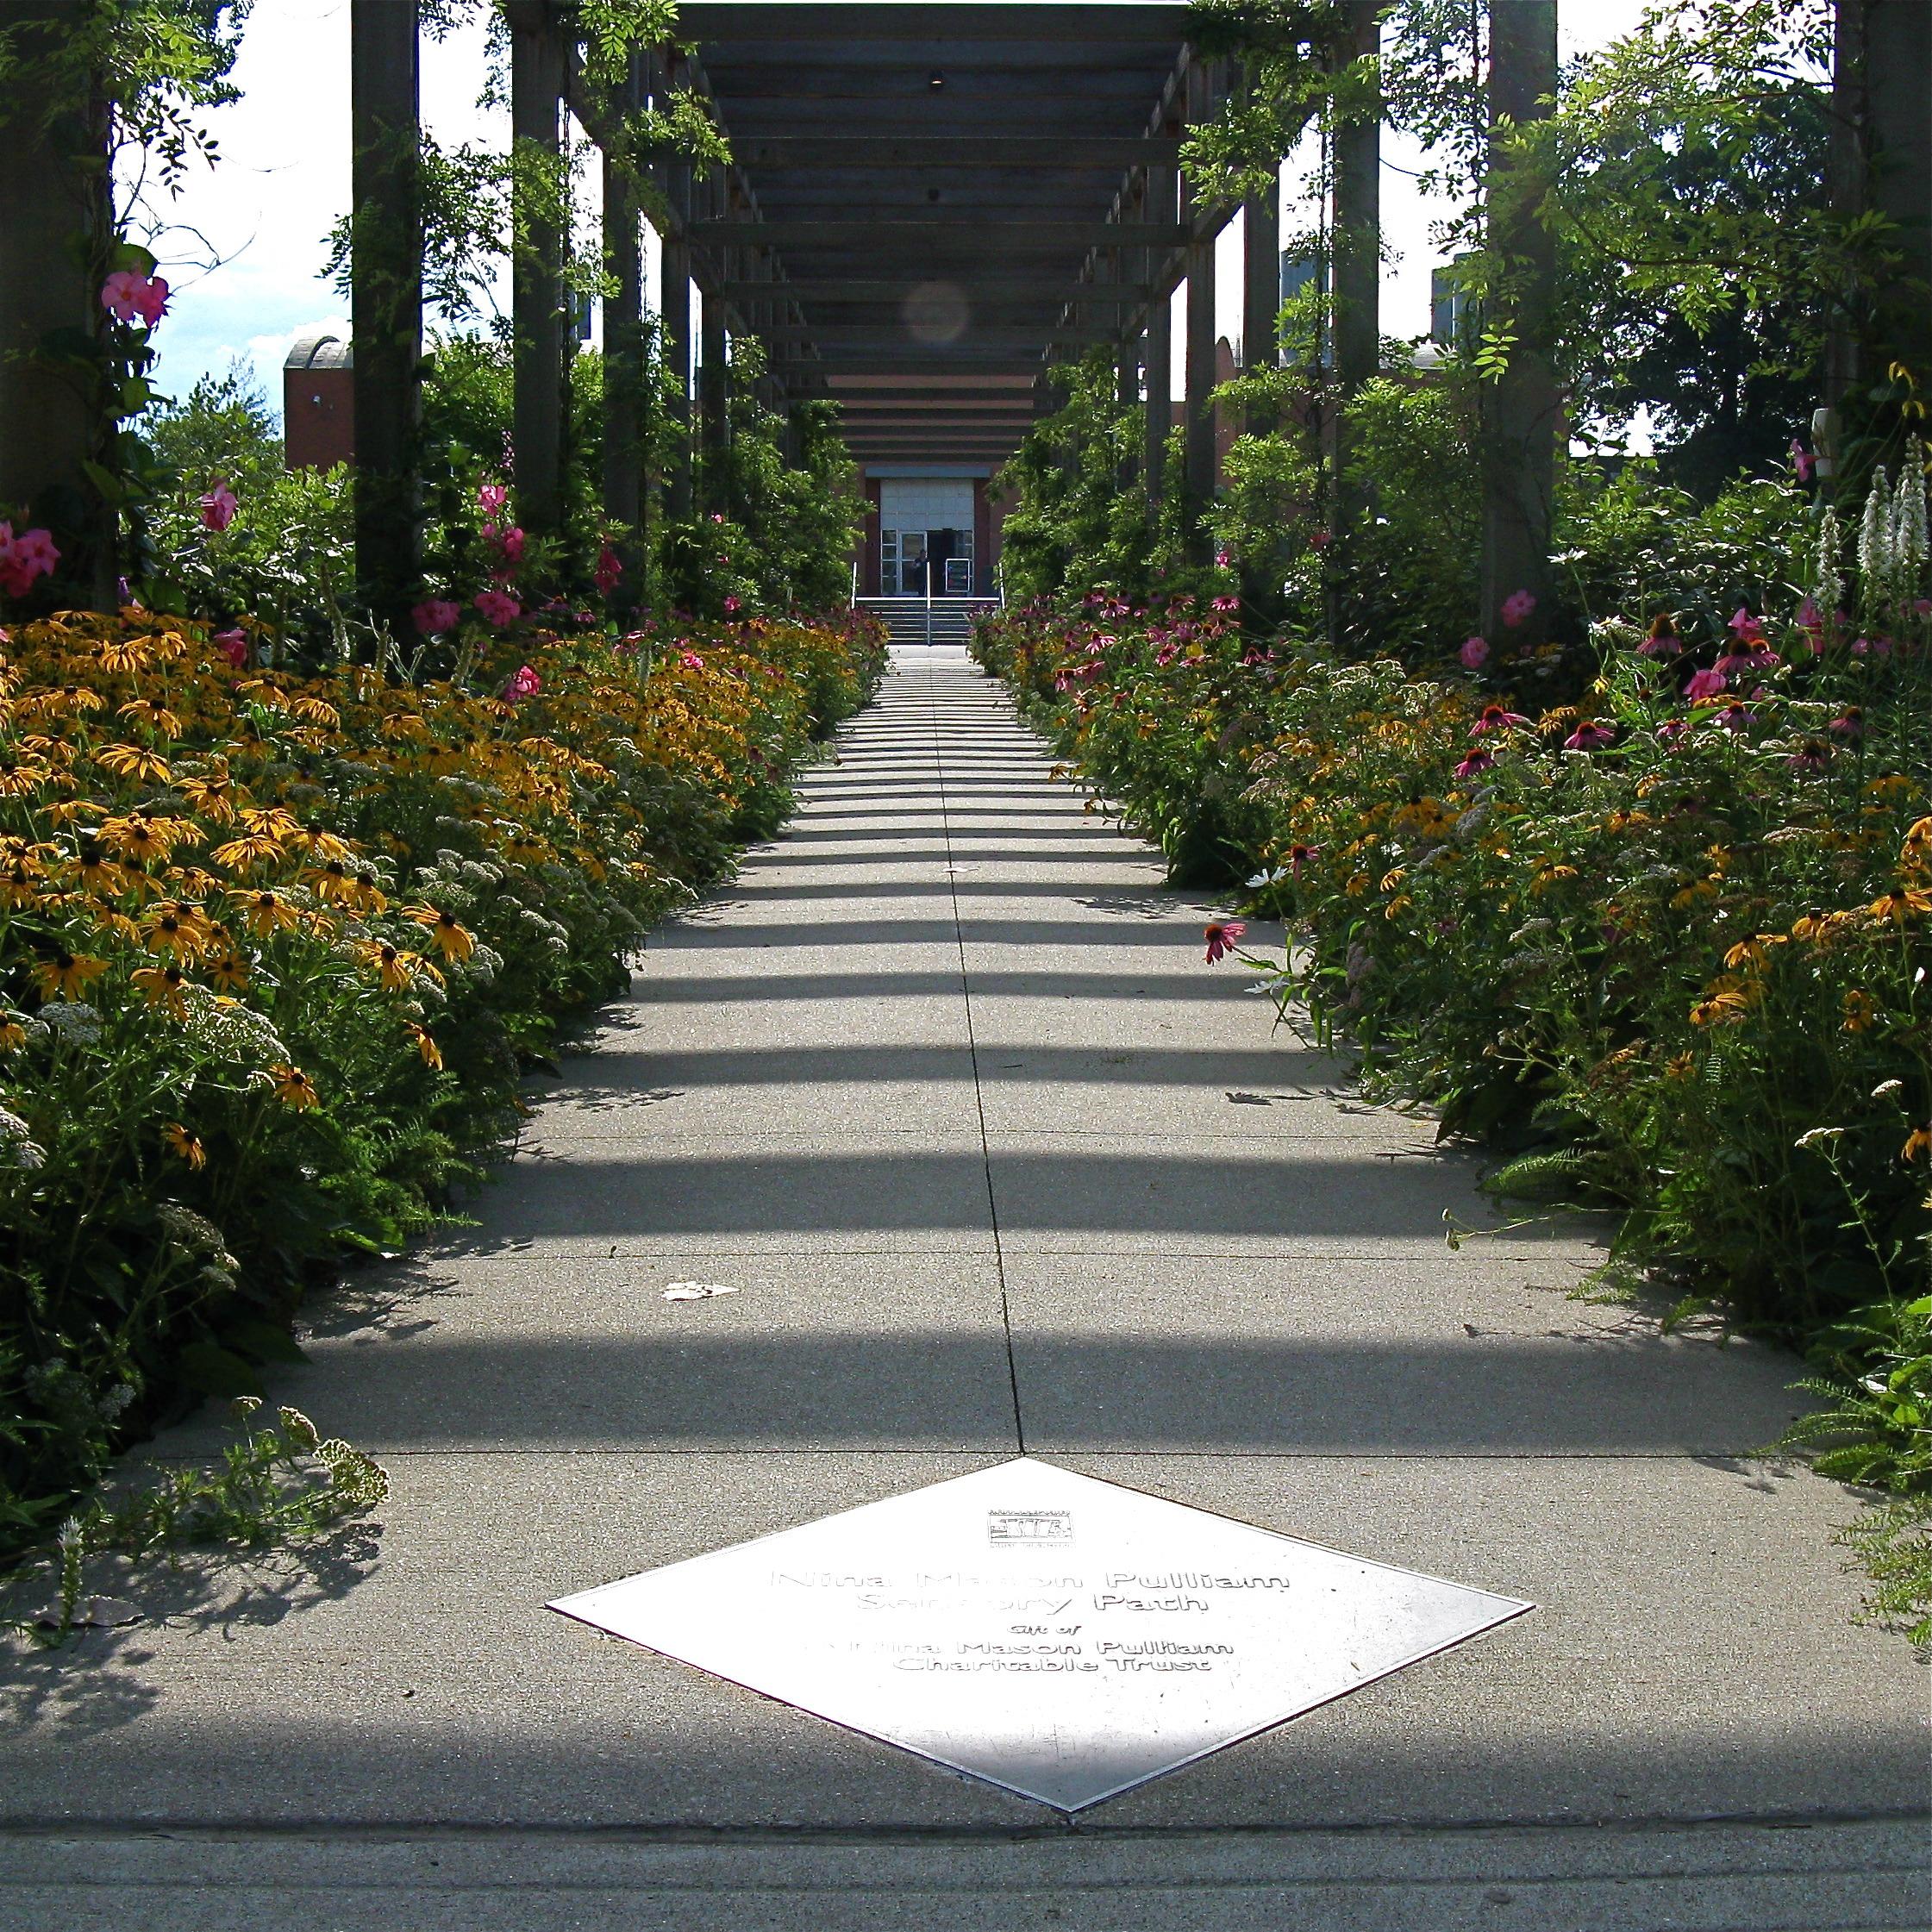 Sensory path at the Indianapolis Art Center